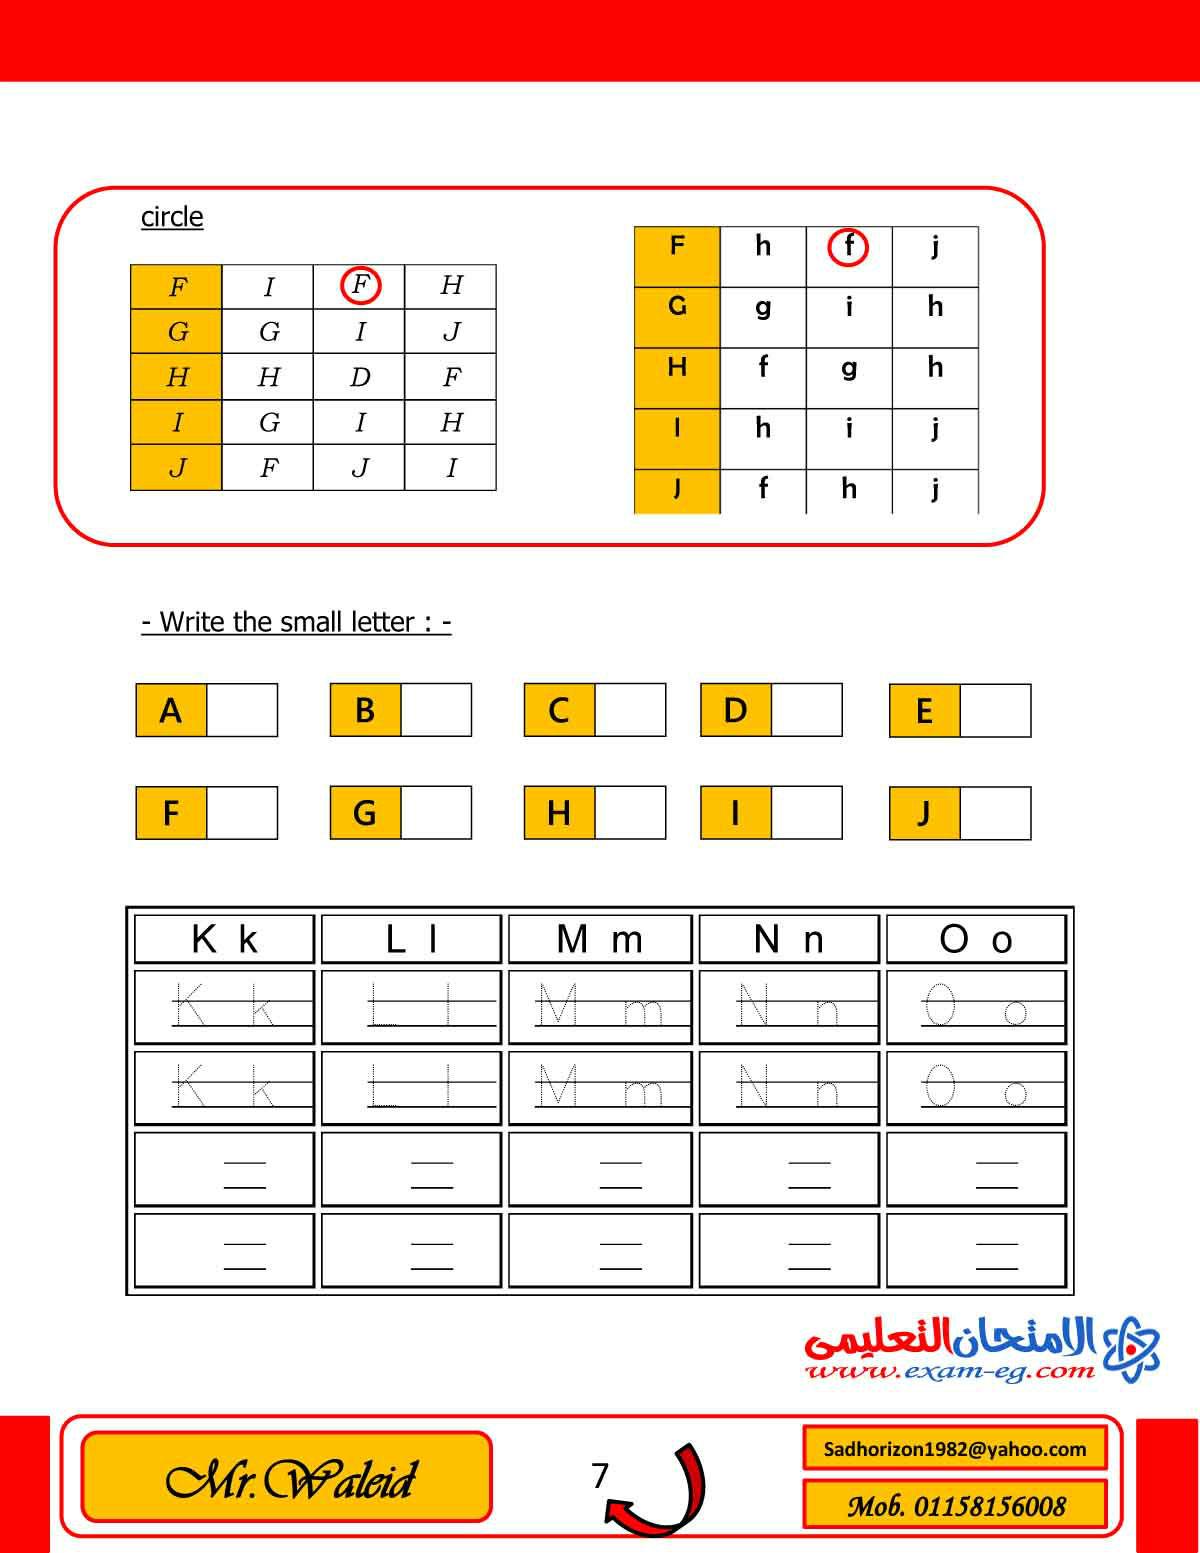 exam-eg.com_1449405243347.jpg